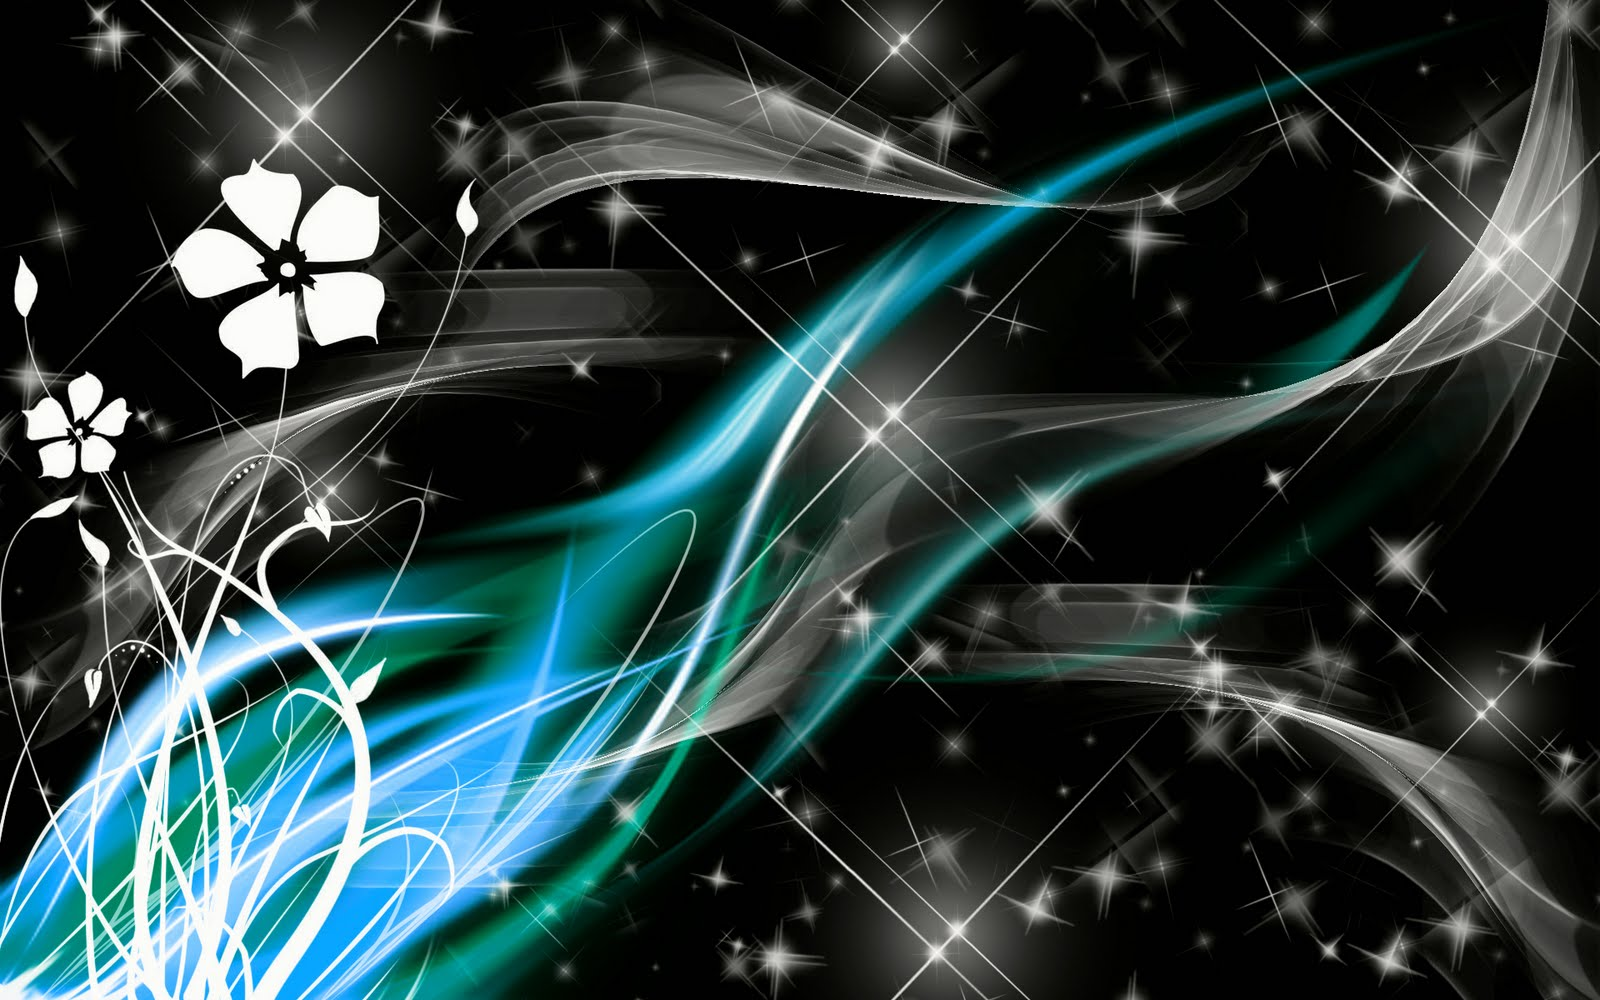 Background Hd Background Kindle Pics 1600x1000